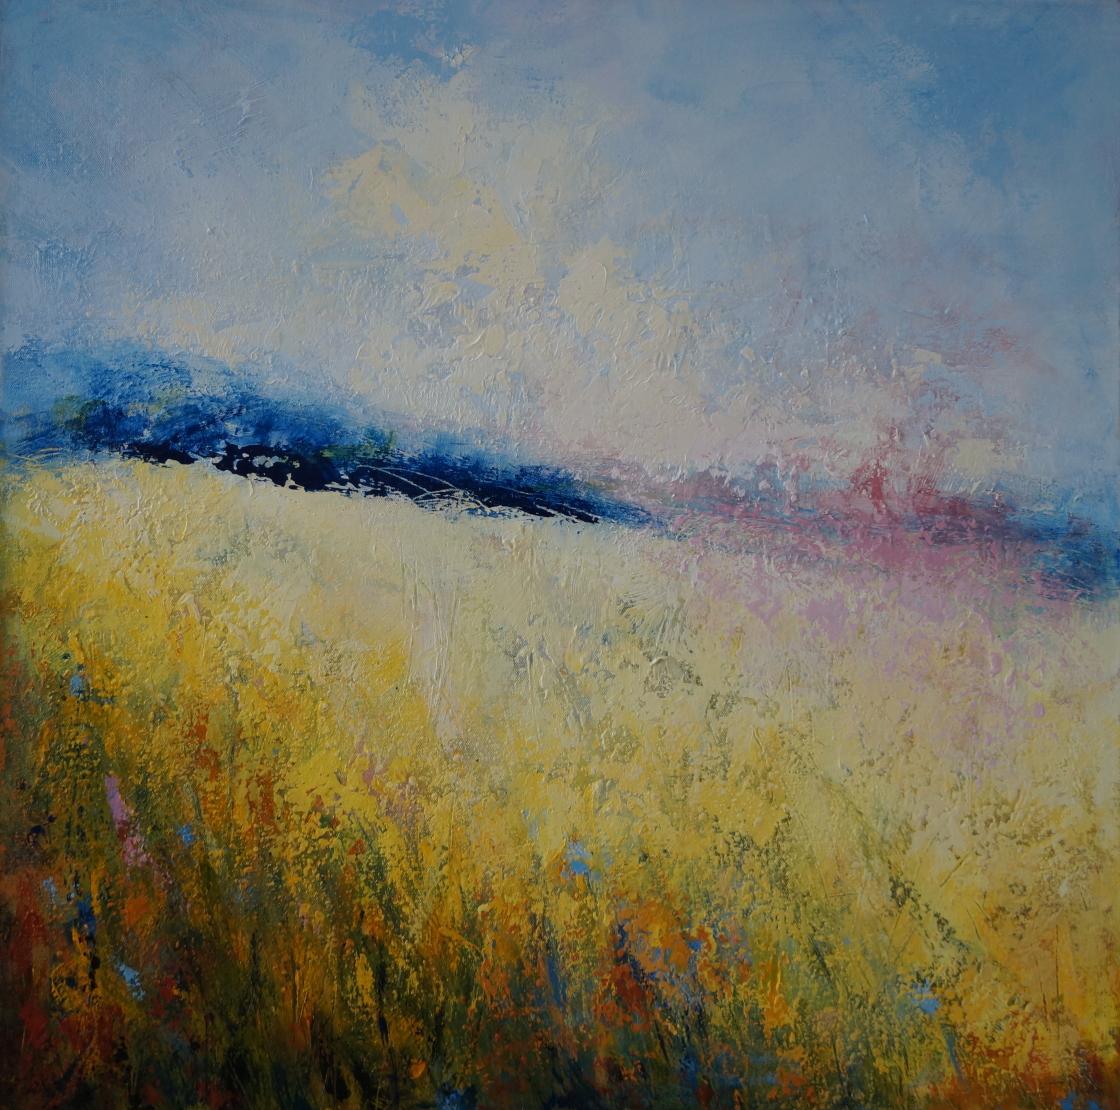 Creamy Sky and Summer Meadow 79 x 79cm